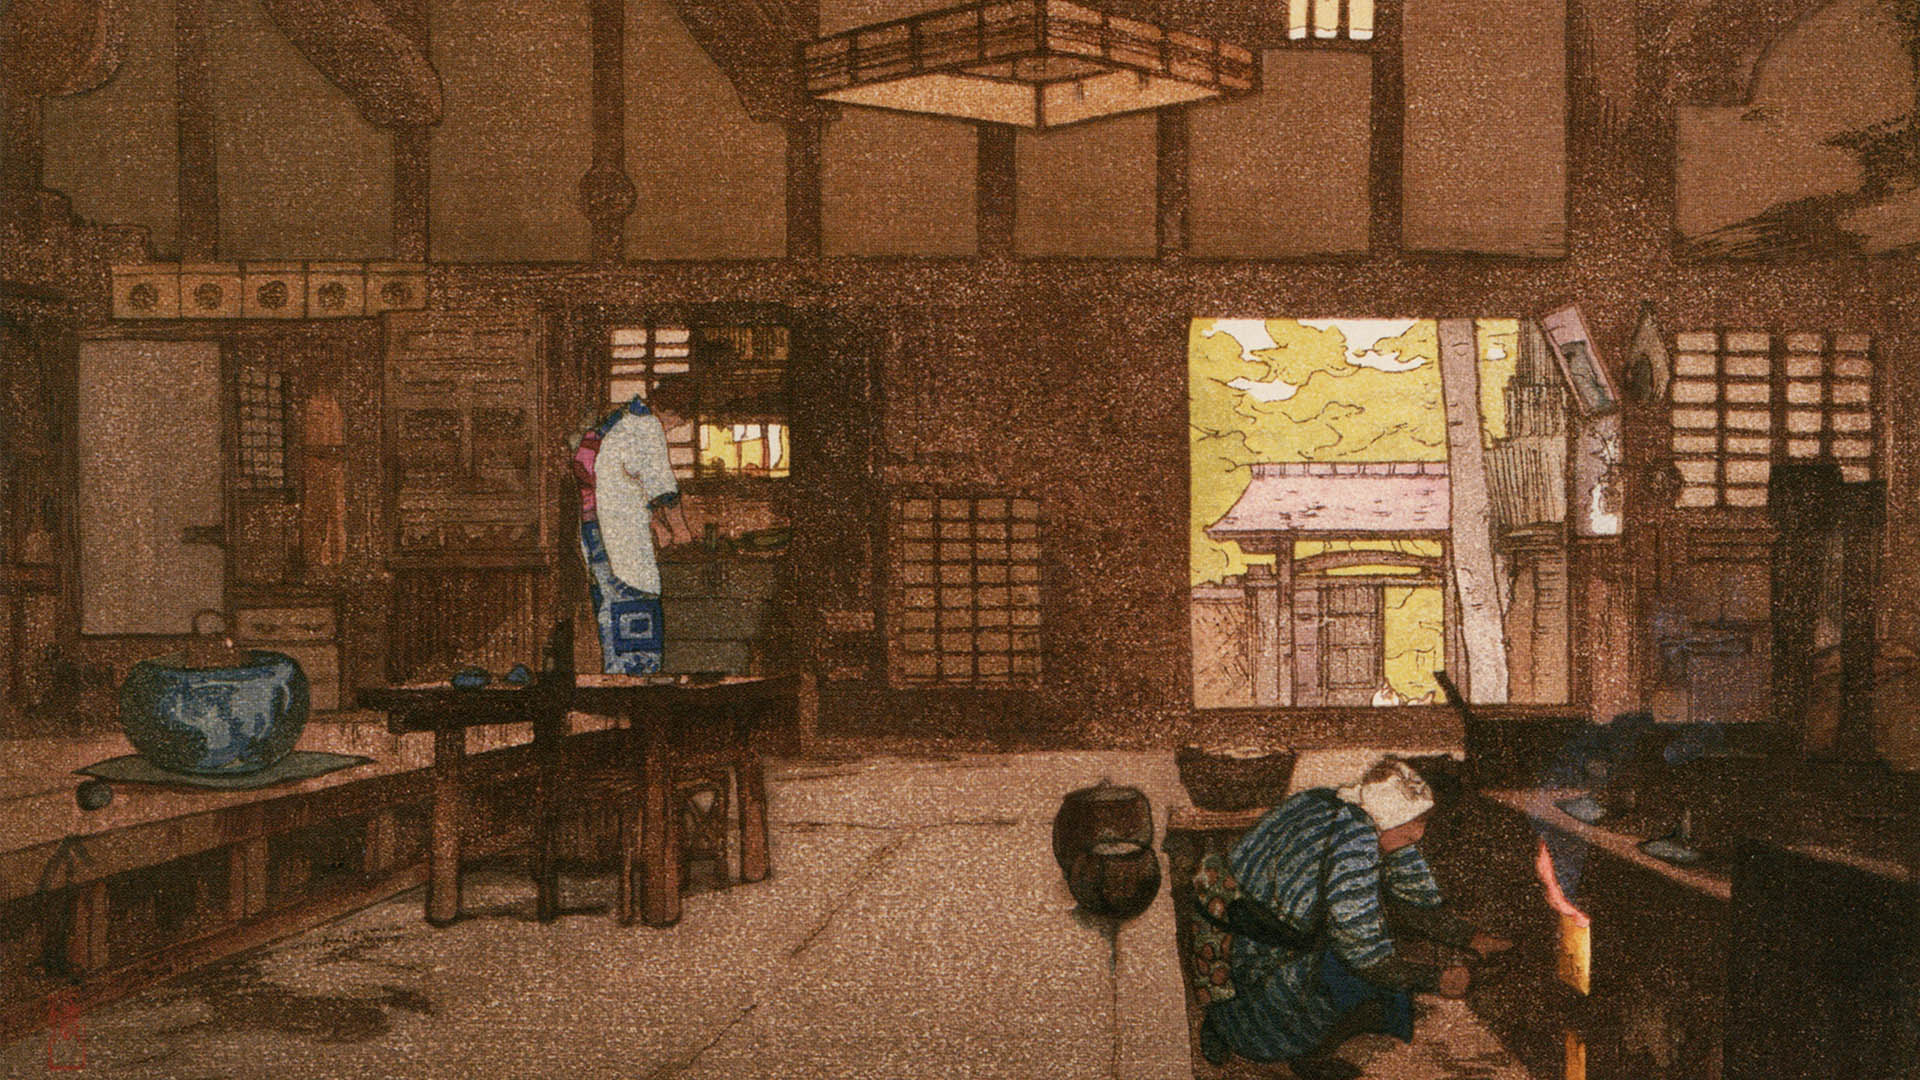 Yoshida Hiroshi - Nouka 1920x1080